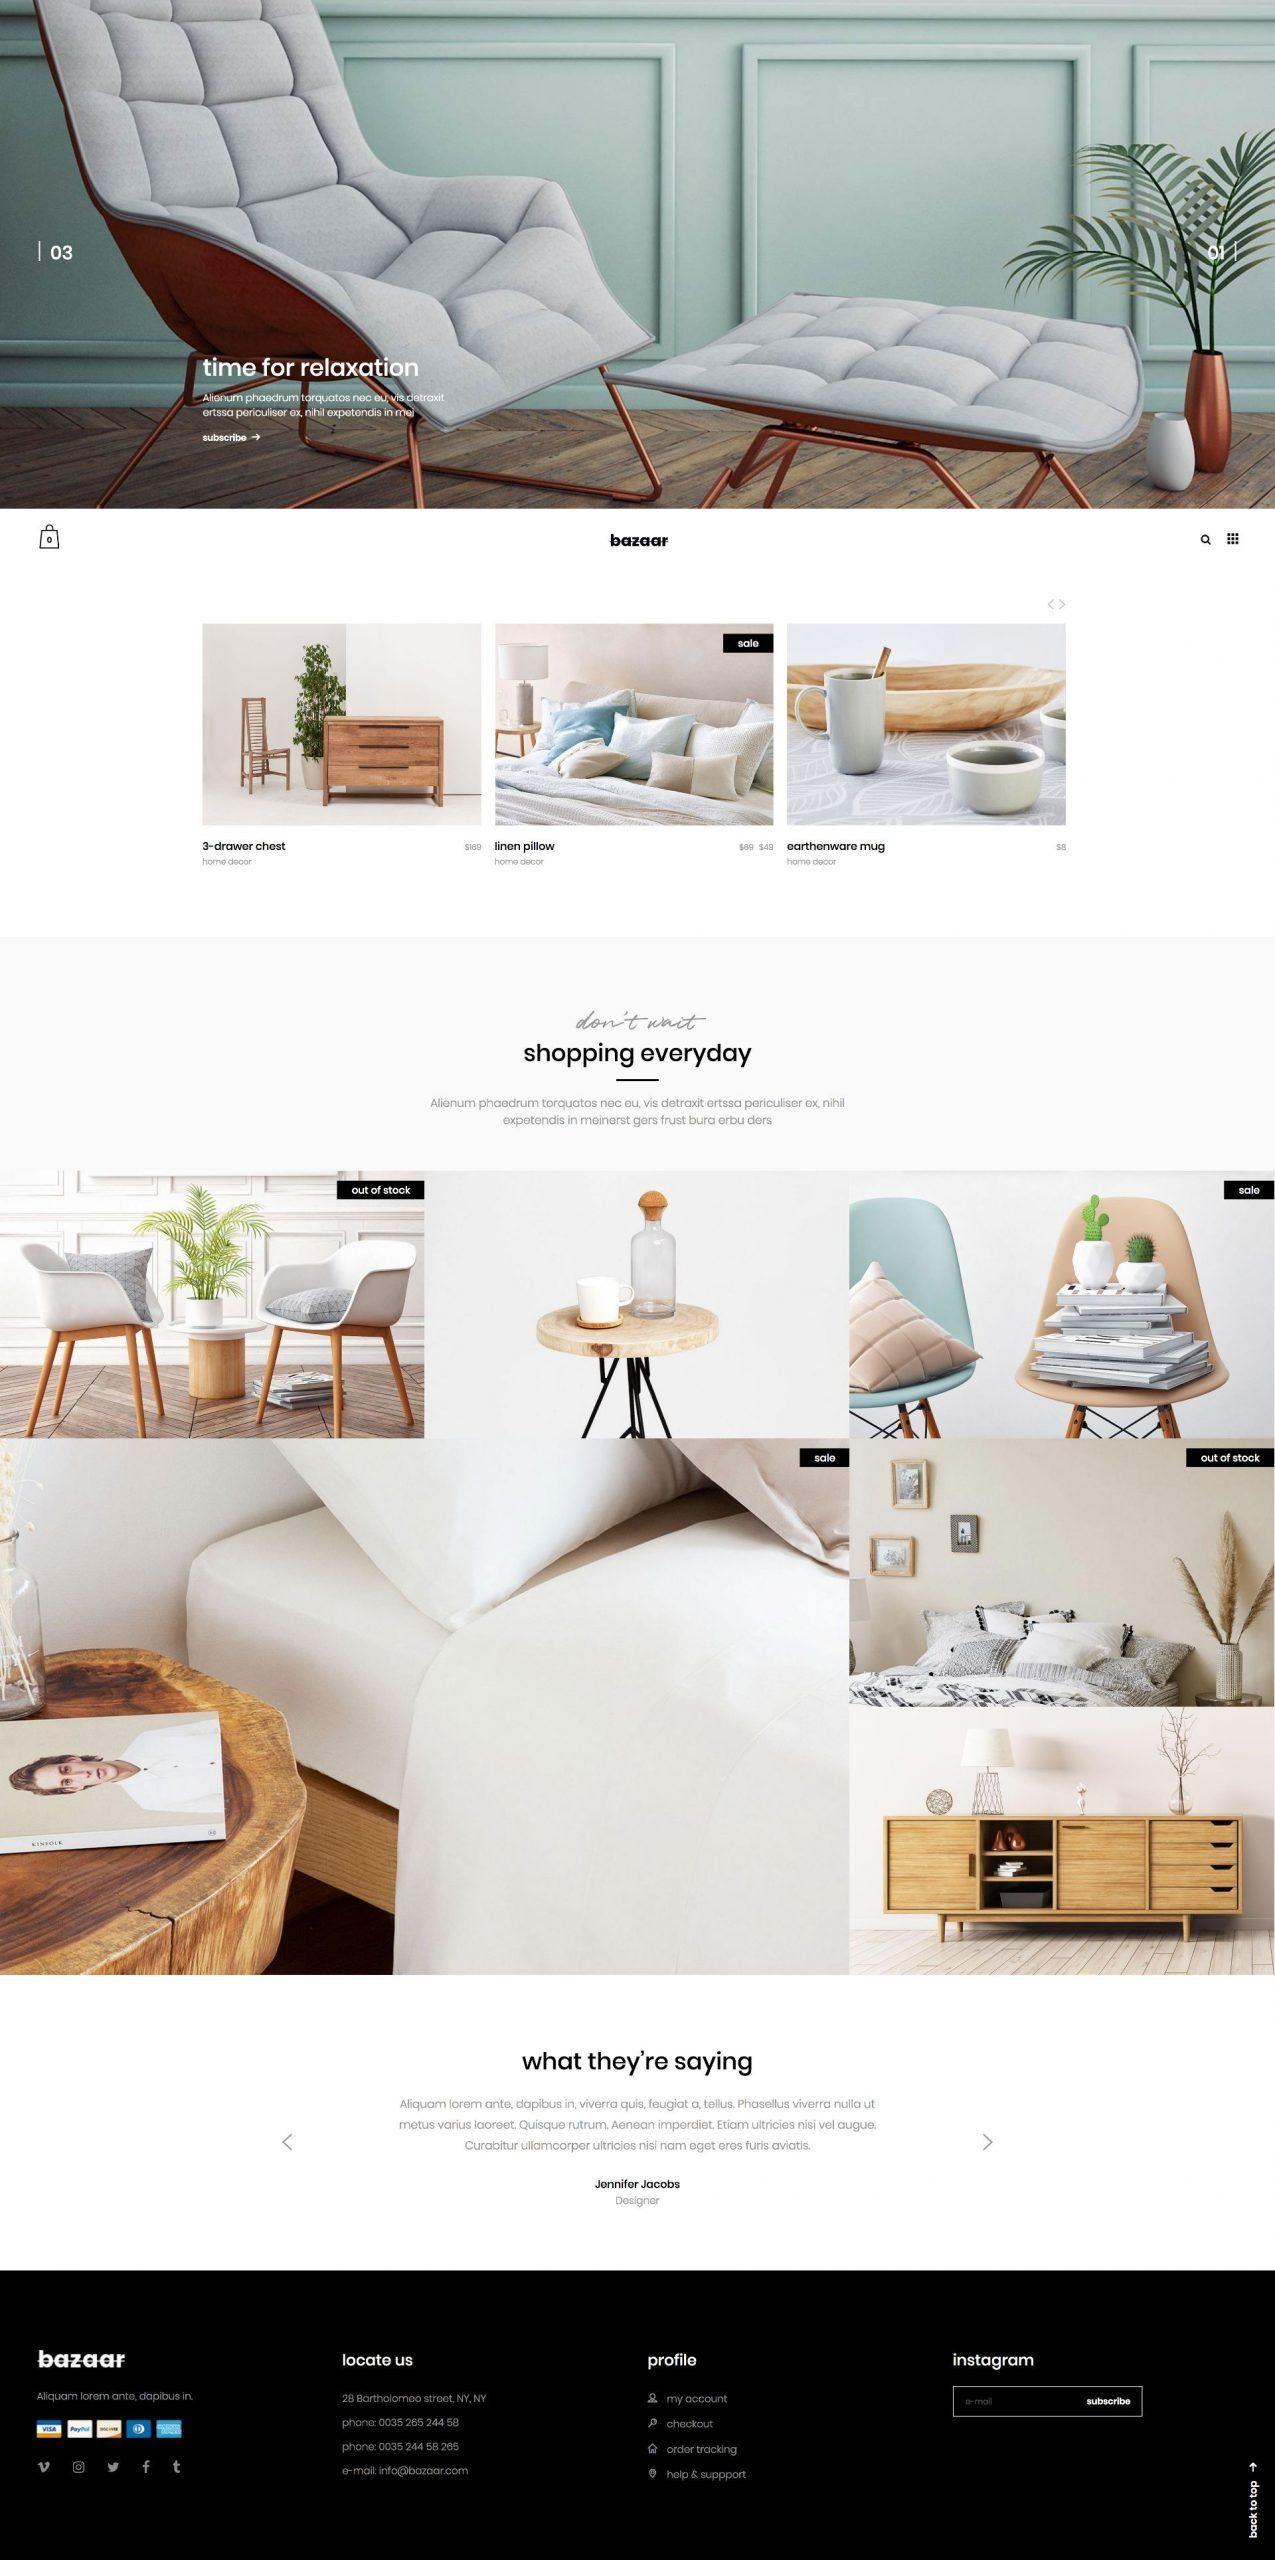 Best Home Decor Shopping Websites Modern Clean Shopping Website For Decor And Furnitur Best Interior Design Websites Home Decor Shops Best Home Interior Design